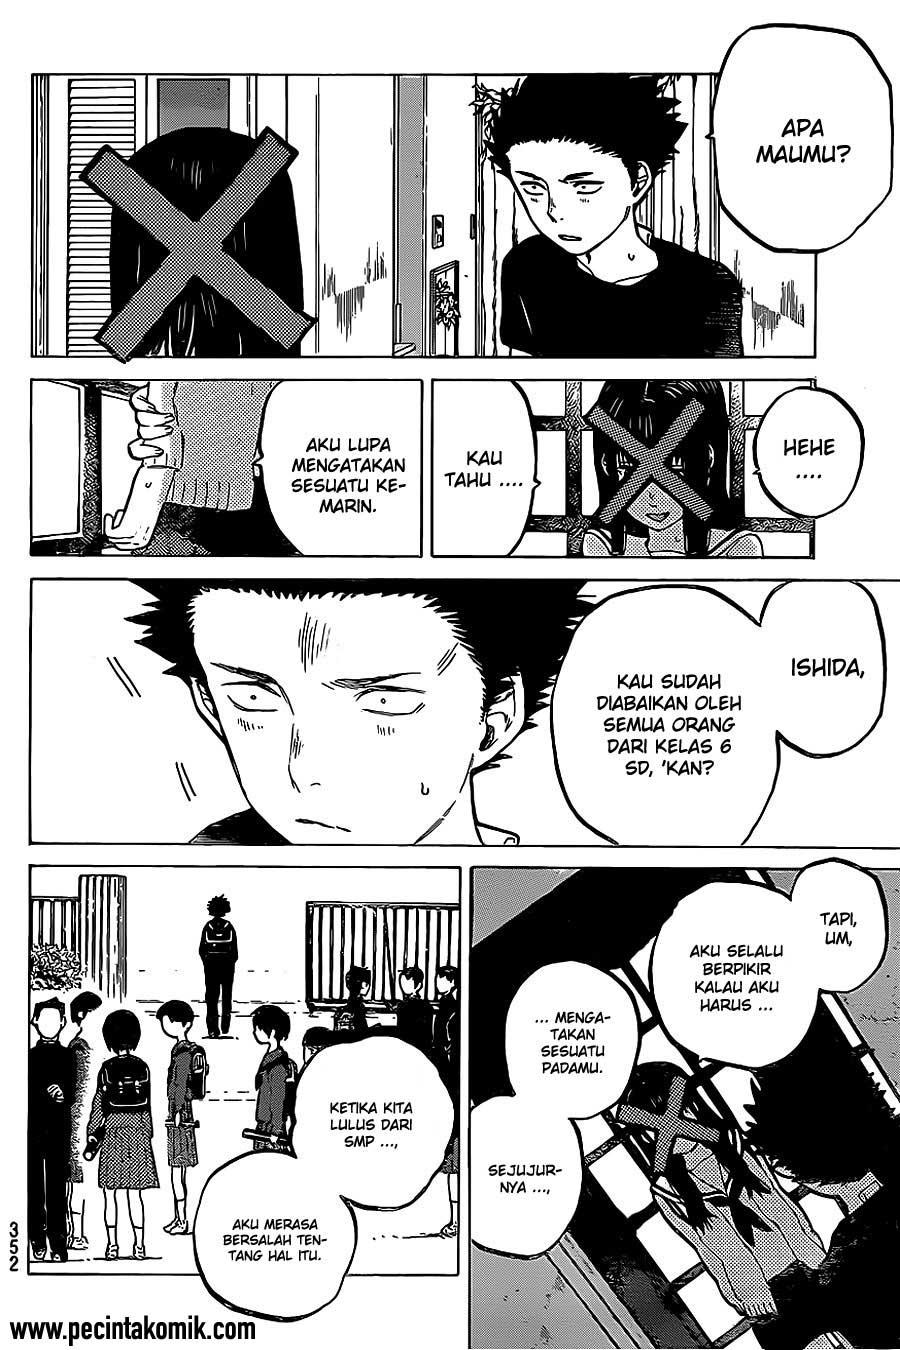 Koe no Katachi Chapter 22-7